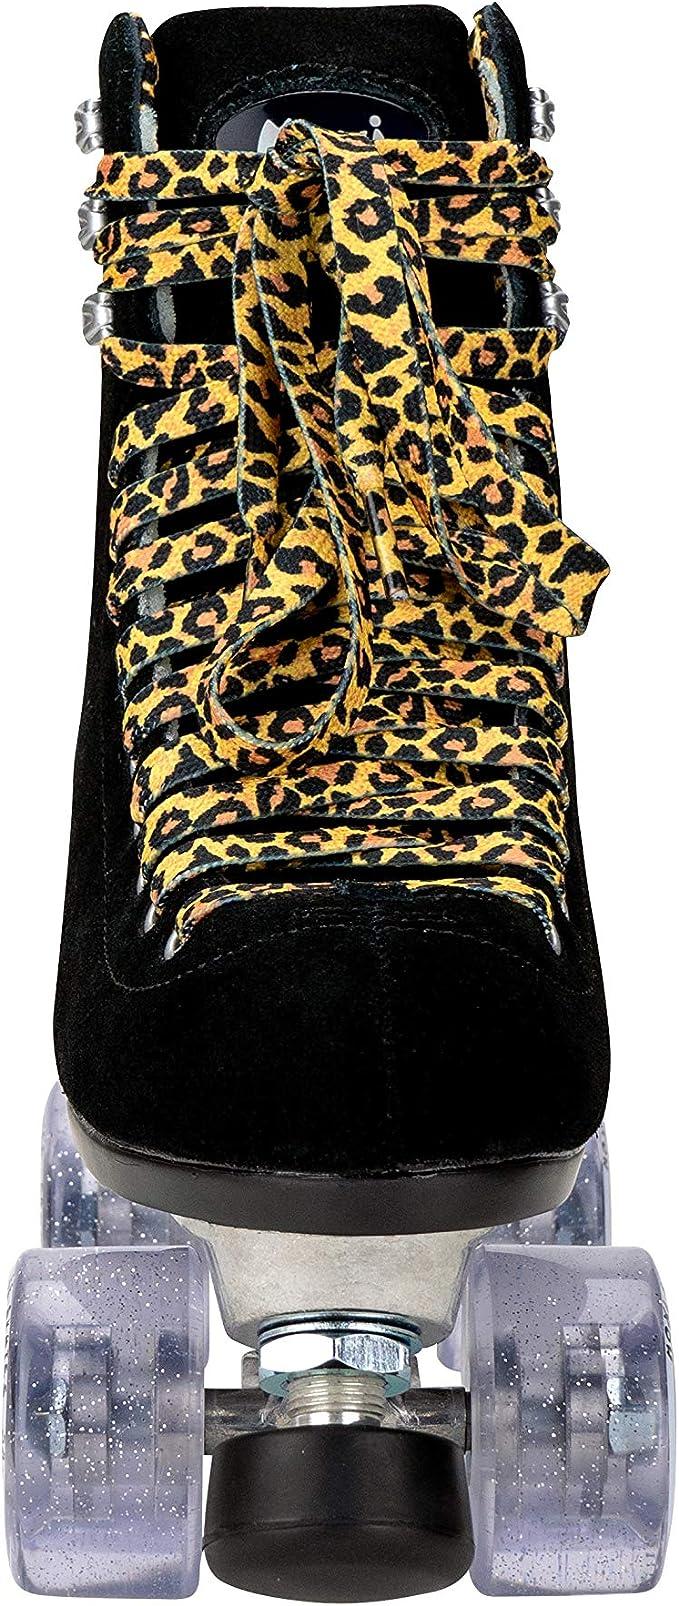 Moxi Panther Set Rollschuhe Wildleder schwarz